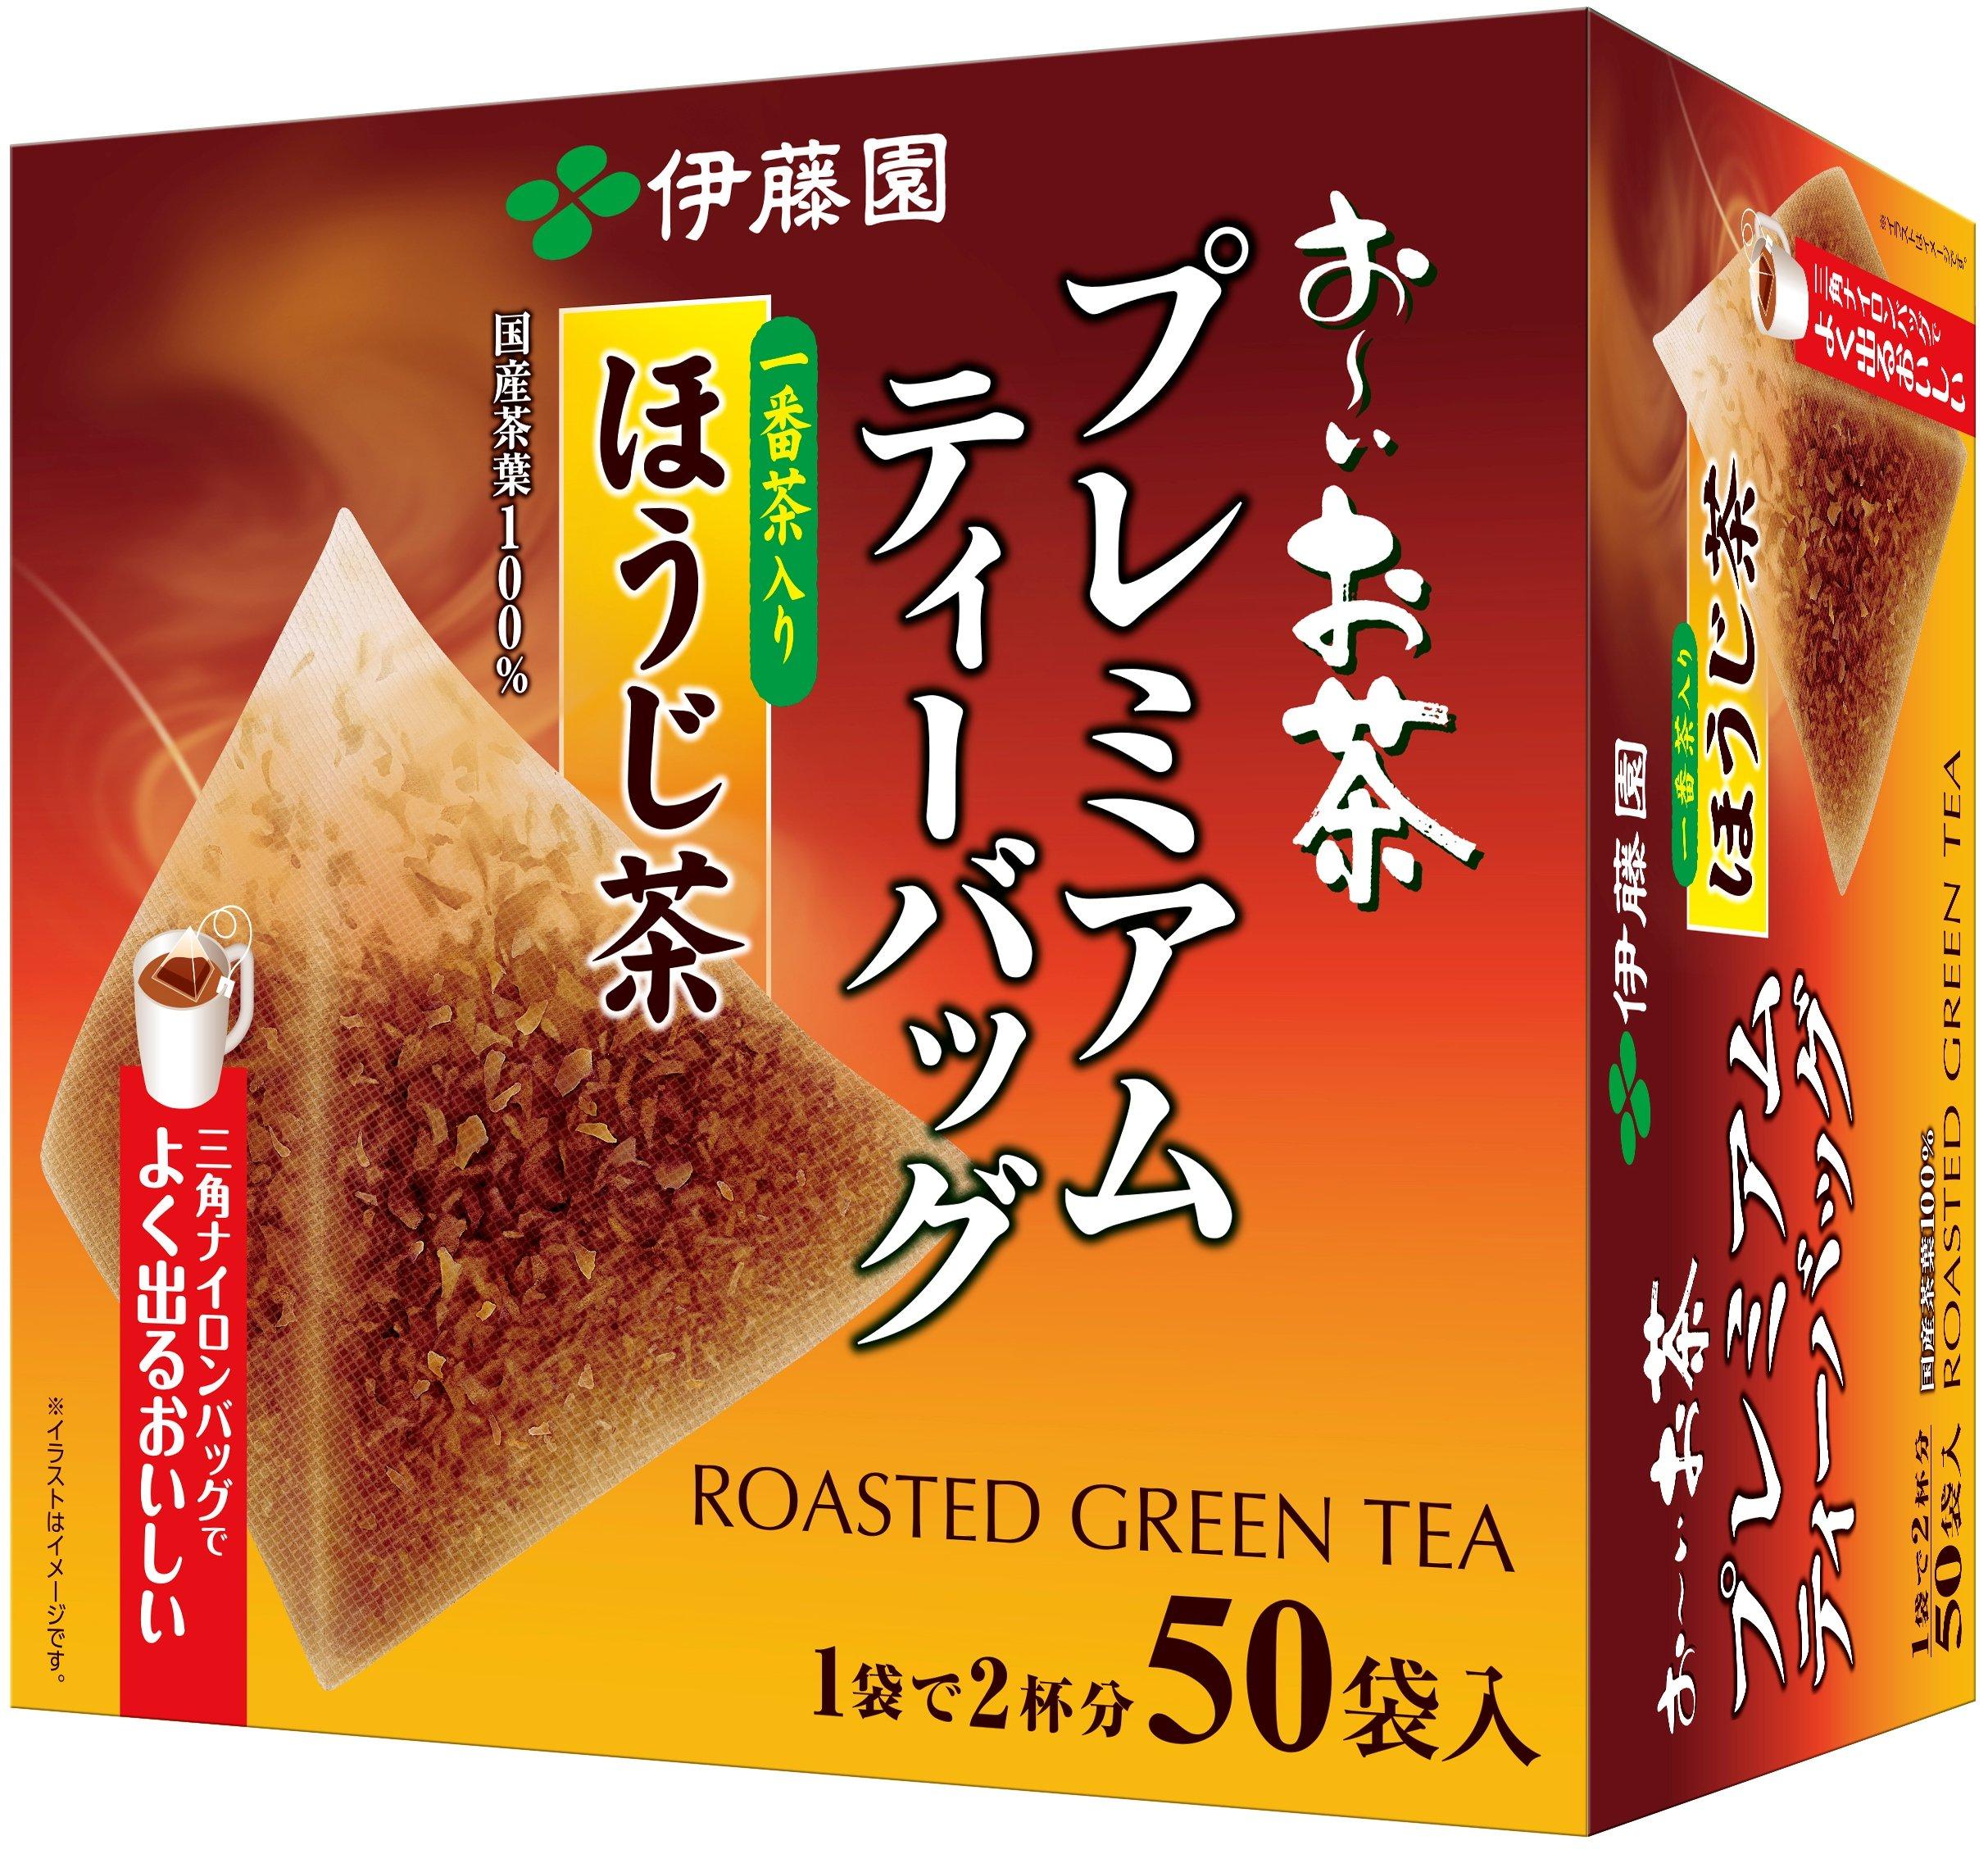 Itoen Hojicha (Roasted Green Tea) Premium bag Pack of 50